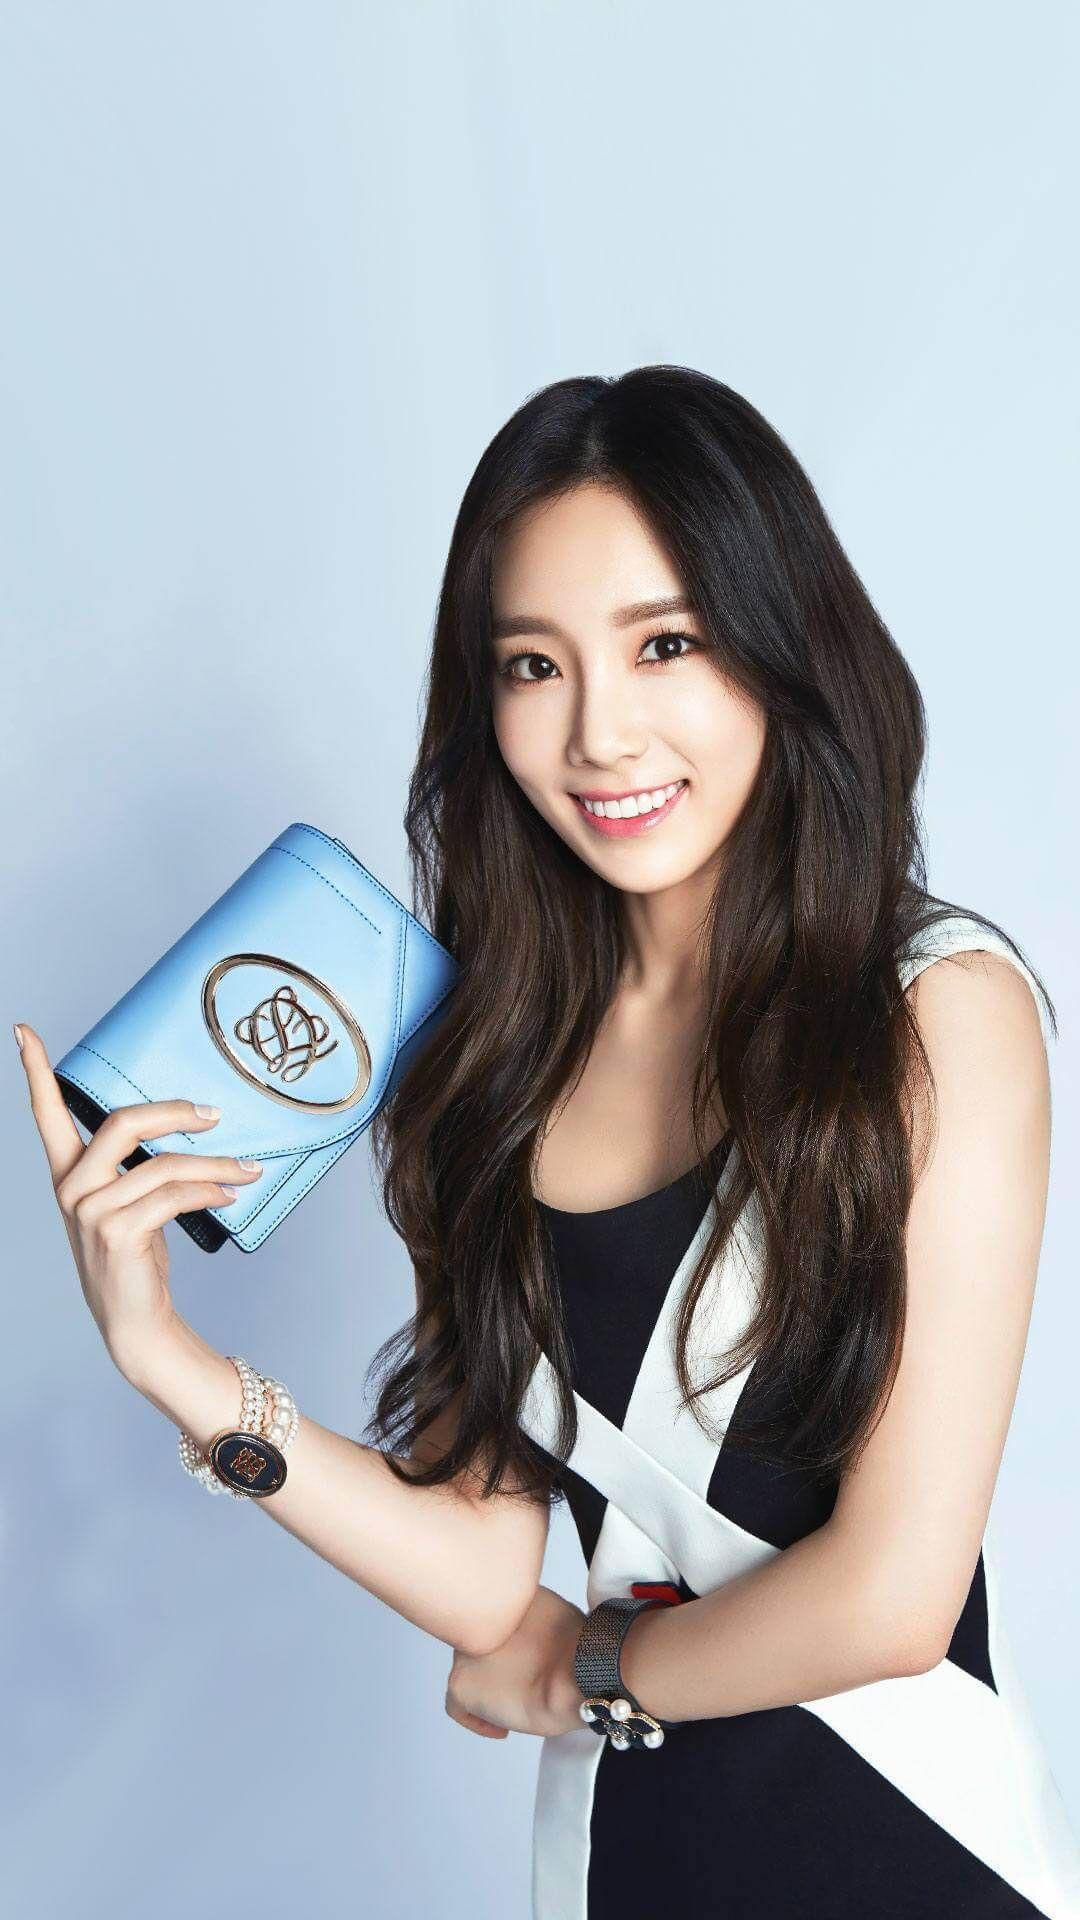 Iphone 6 wallpaper tumblr kpop - Kim Taeyeon 2016 Wallpaper For Iphone 6 Hd